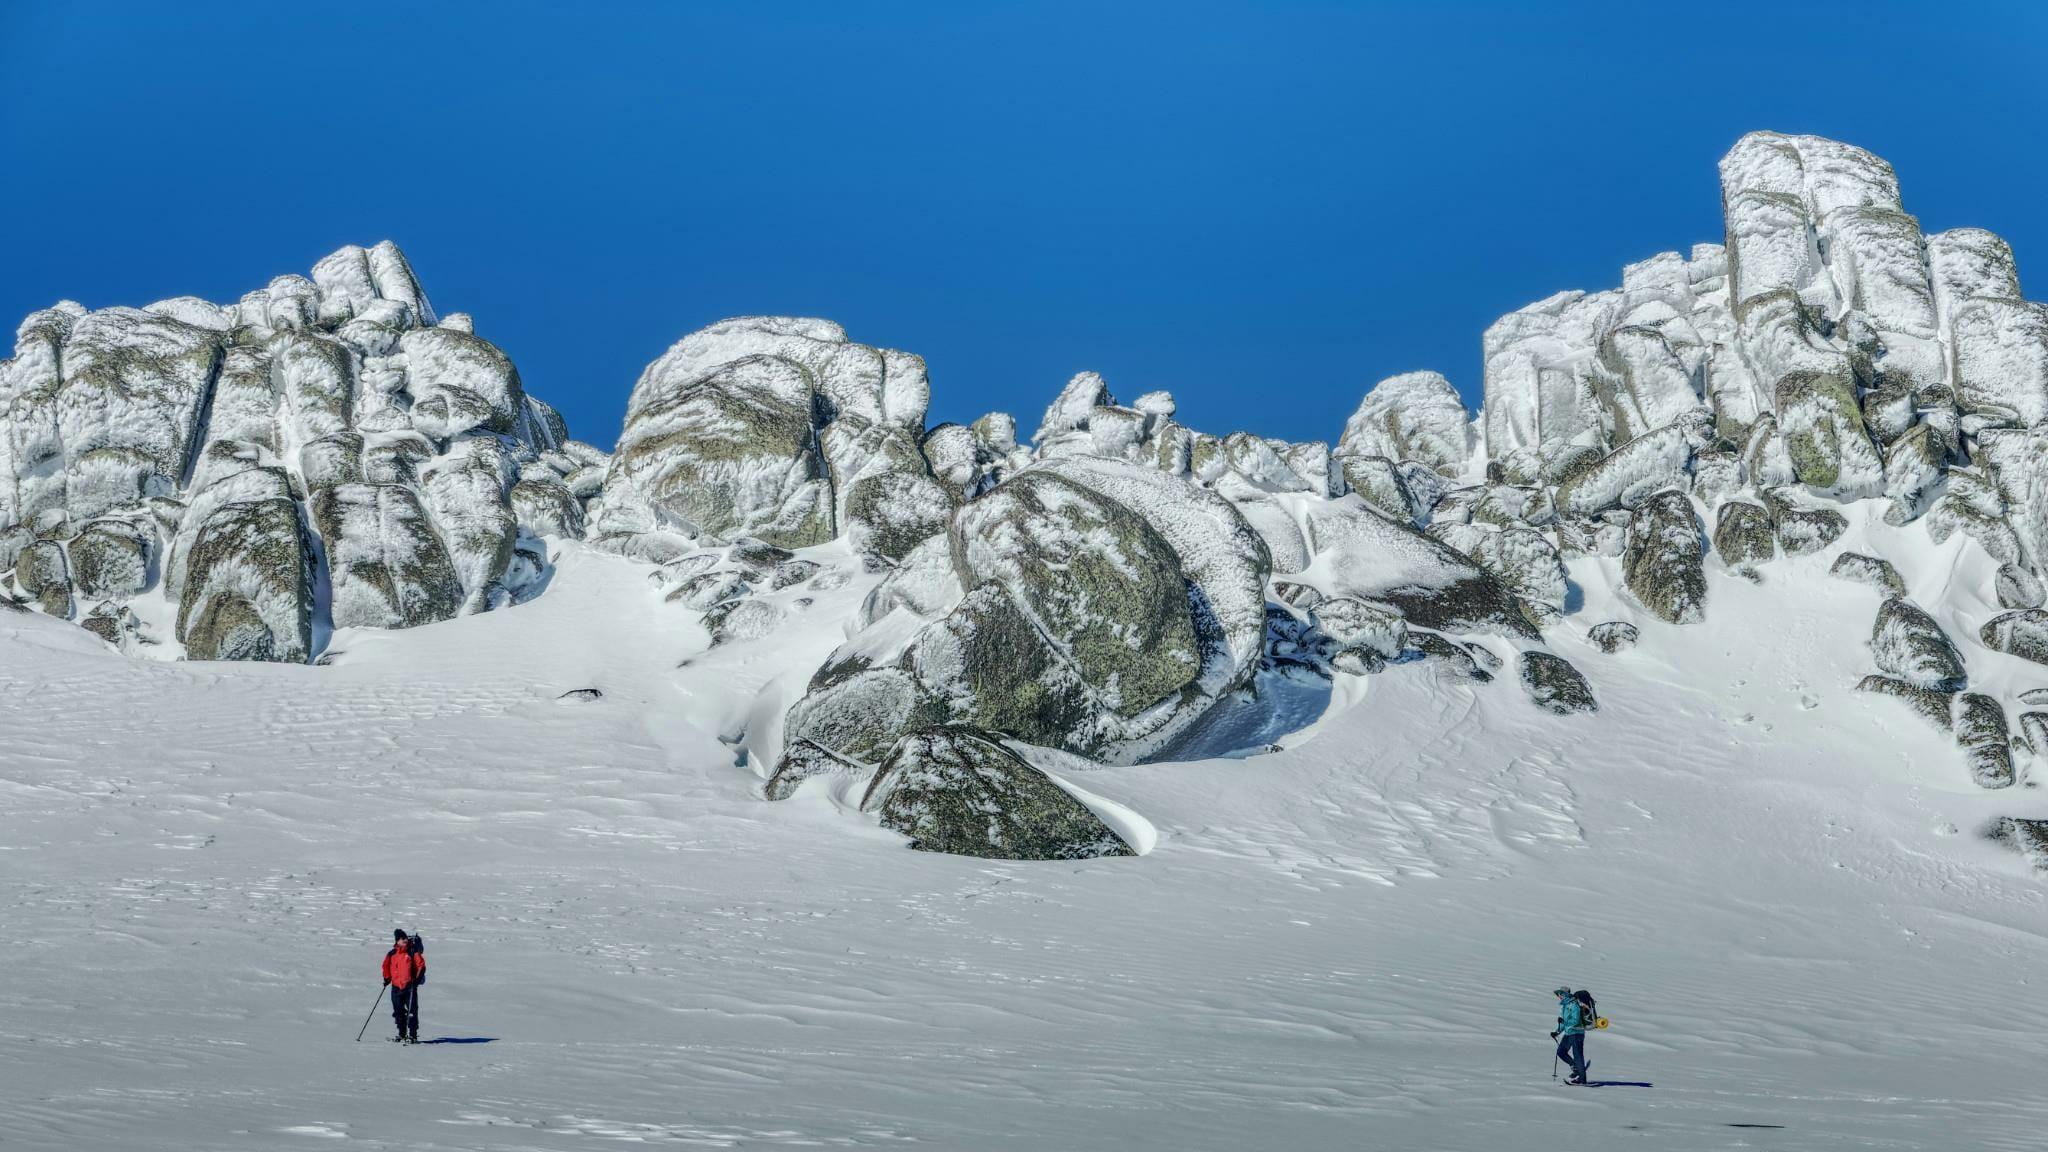 Winter on the Main Range by Michael Grimwade